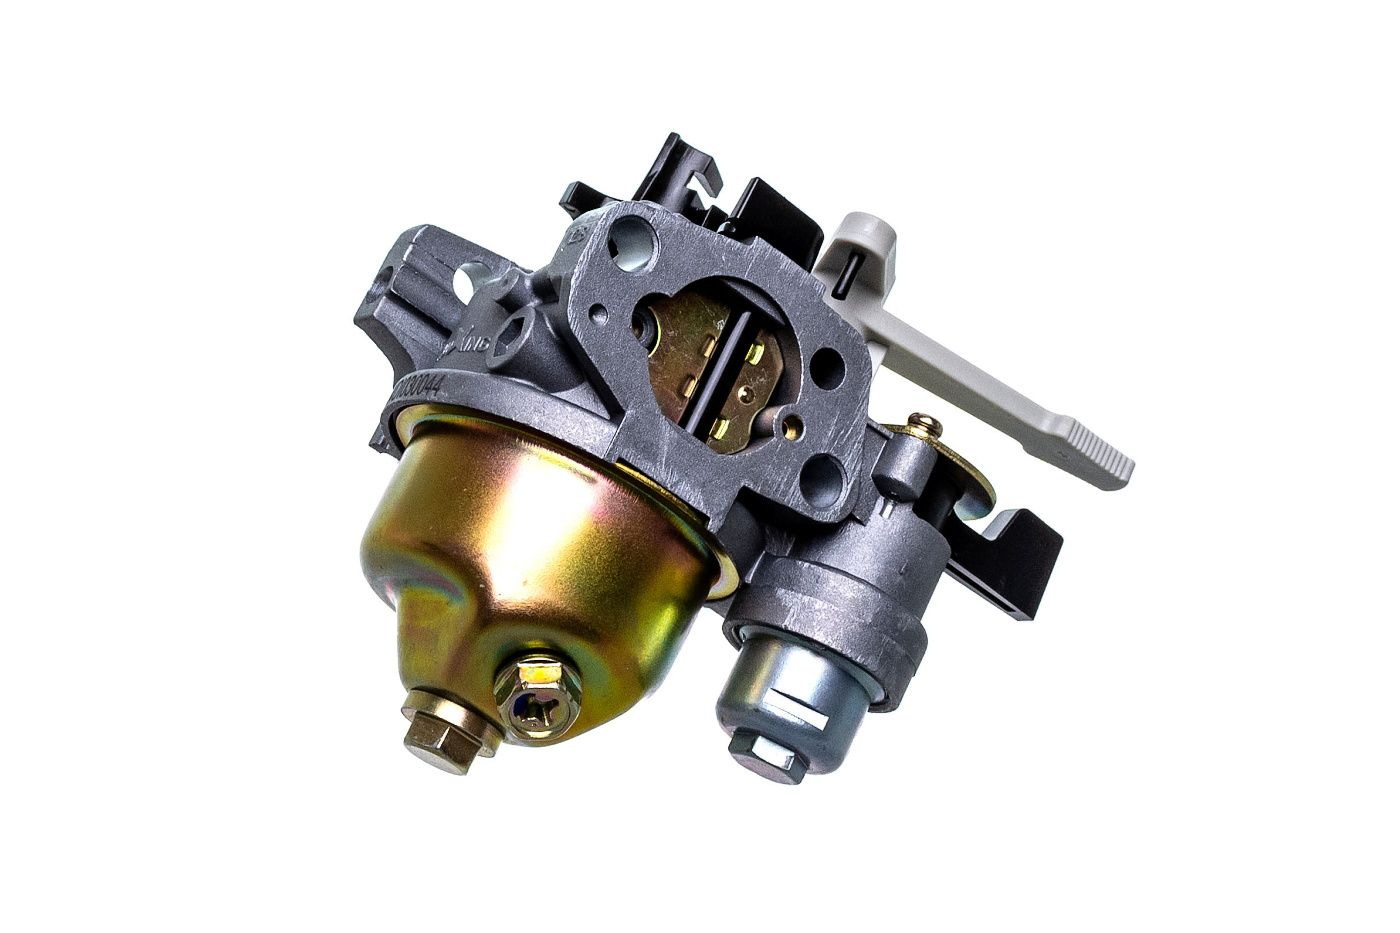 Karburátor HONDA GX160 5.5HP, GX200 6,5HP,16100-ZH8-W61, SUPER AKCIA